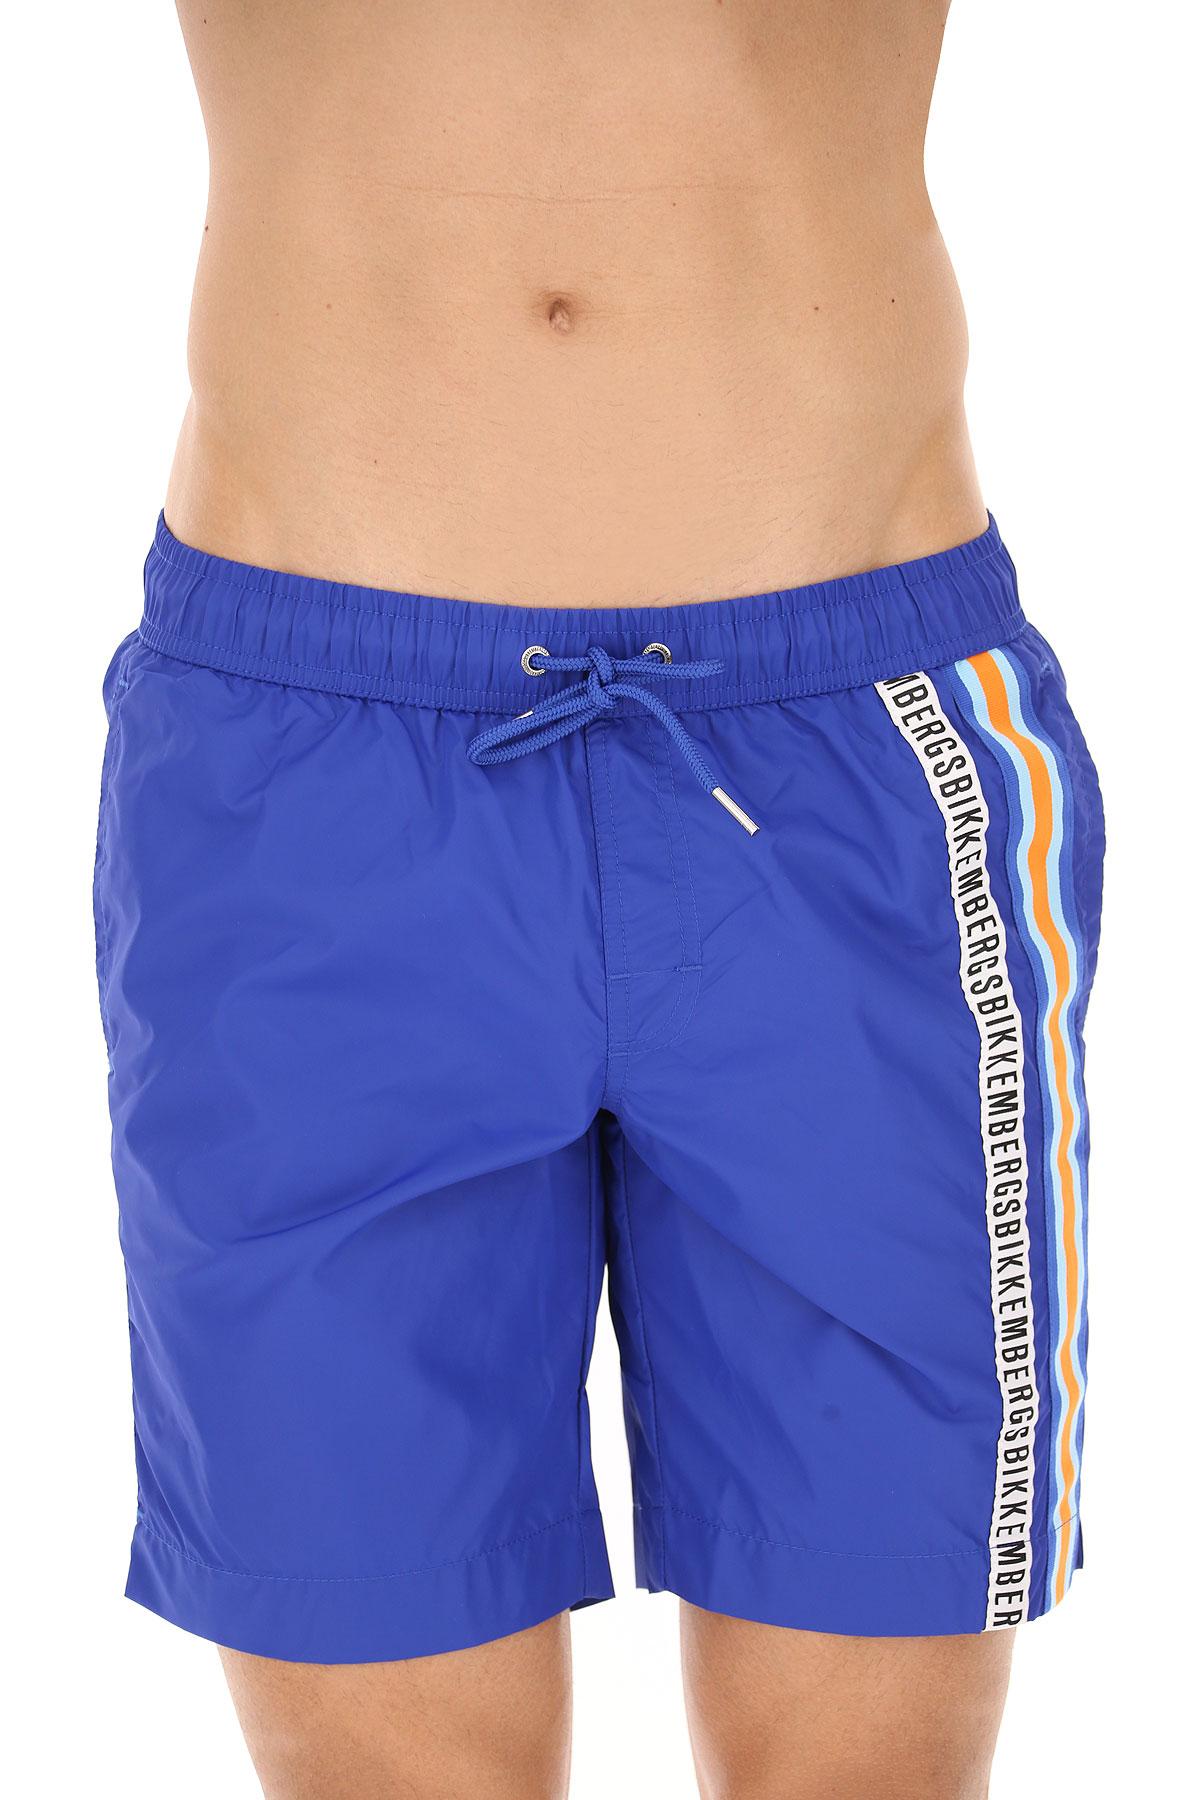 35159ce78e5d0e Mens Swimwear Dirk Bikkembergs, Style code: b6g5050-0222-2020